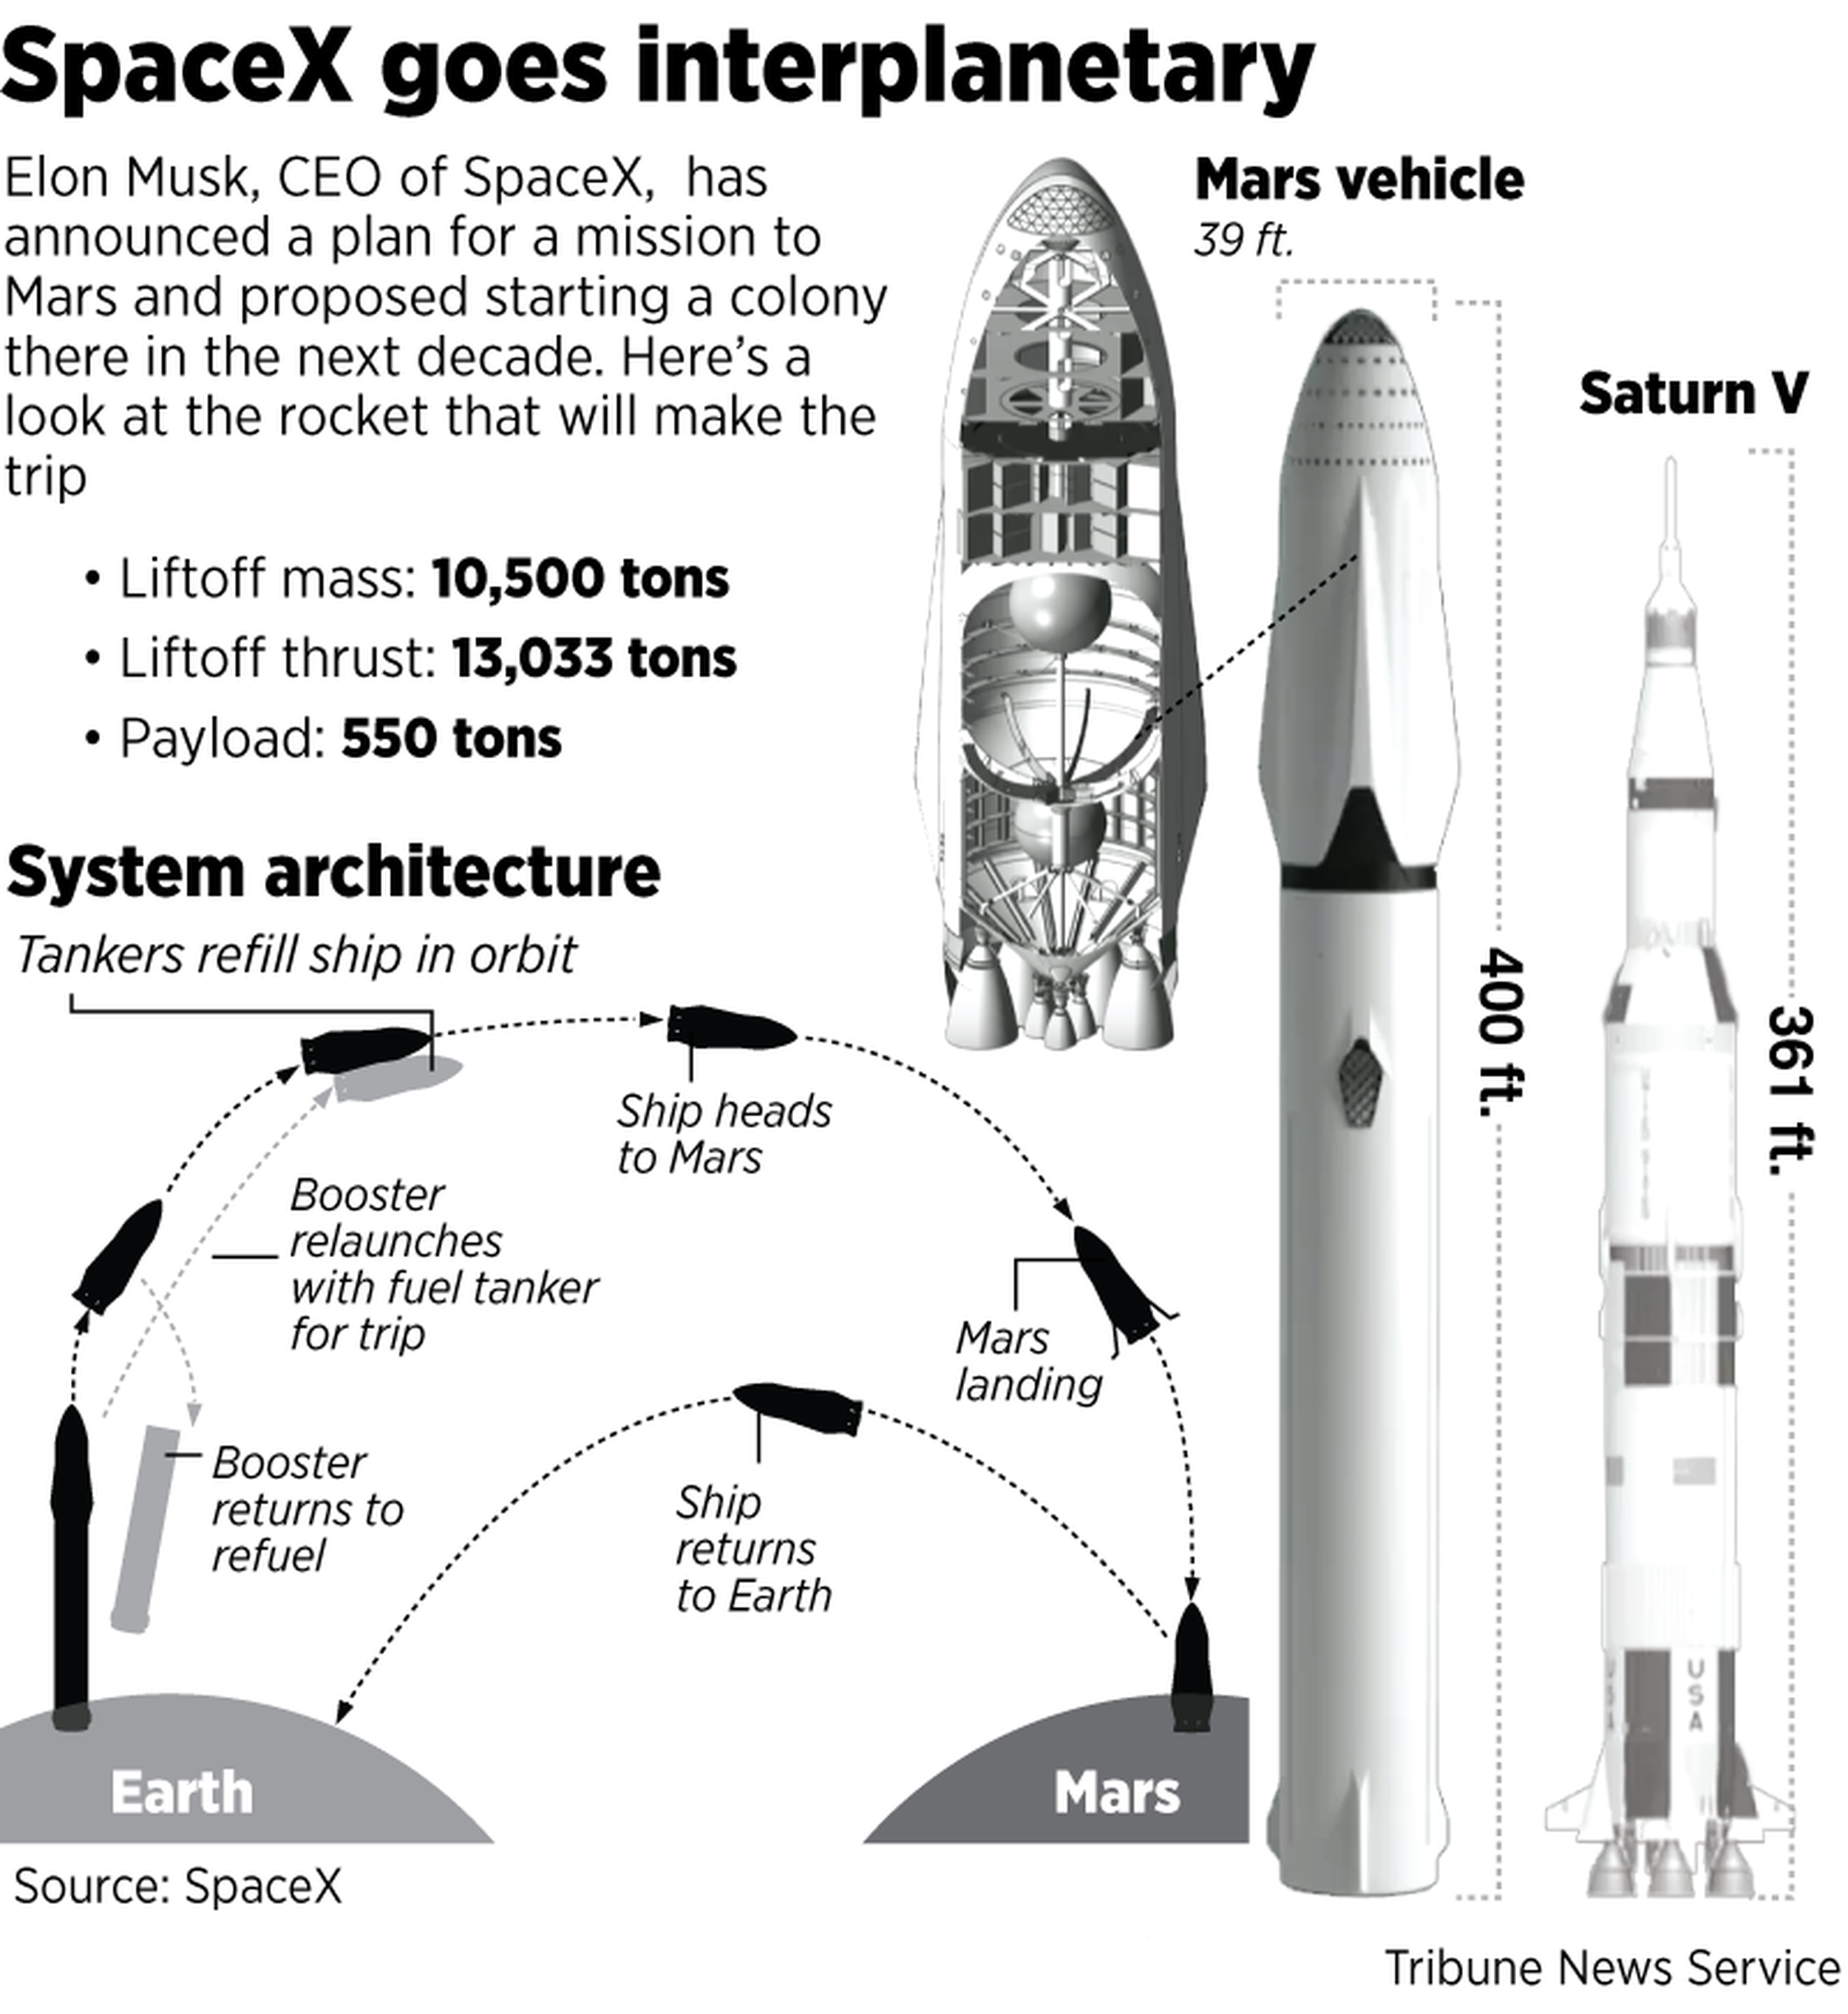 Elon Musk Unveils Plans For Colonizing Mars The Spokesman Review